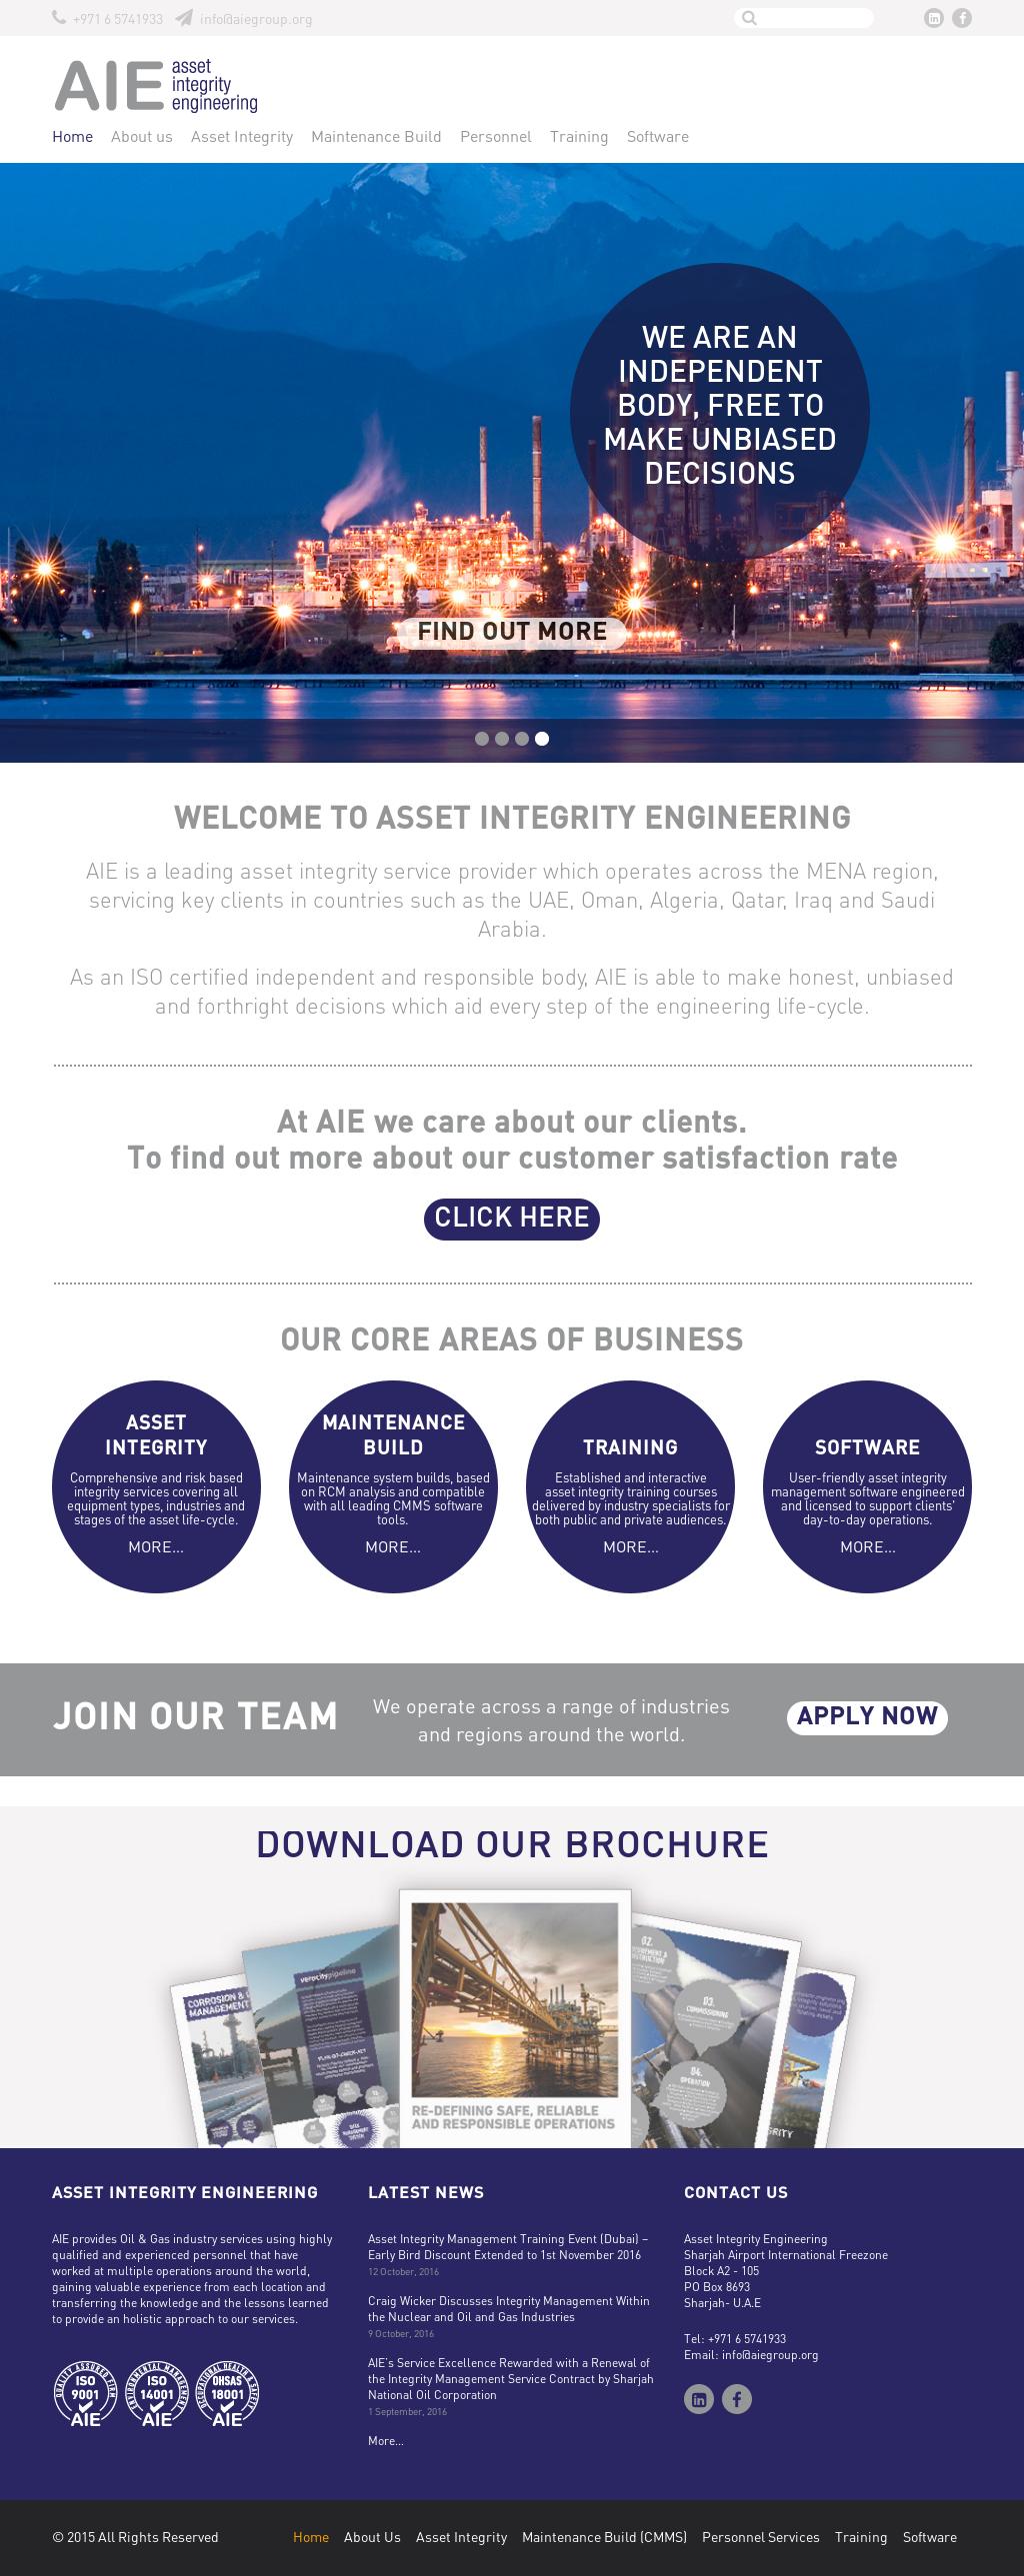 Assetintegrityengineering Competitors, Revenue and Employees